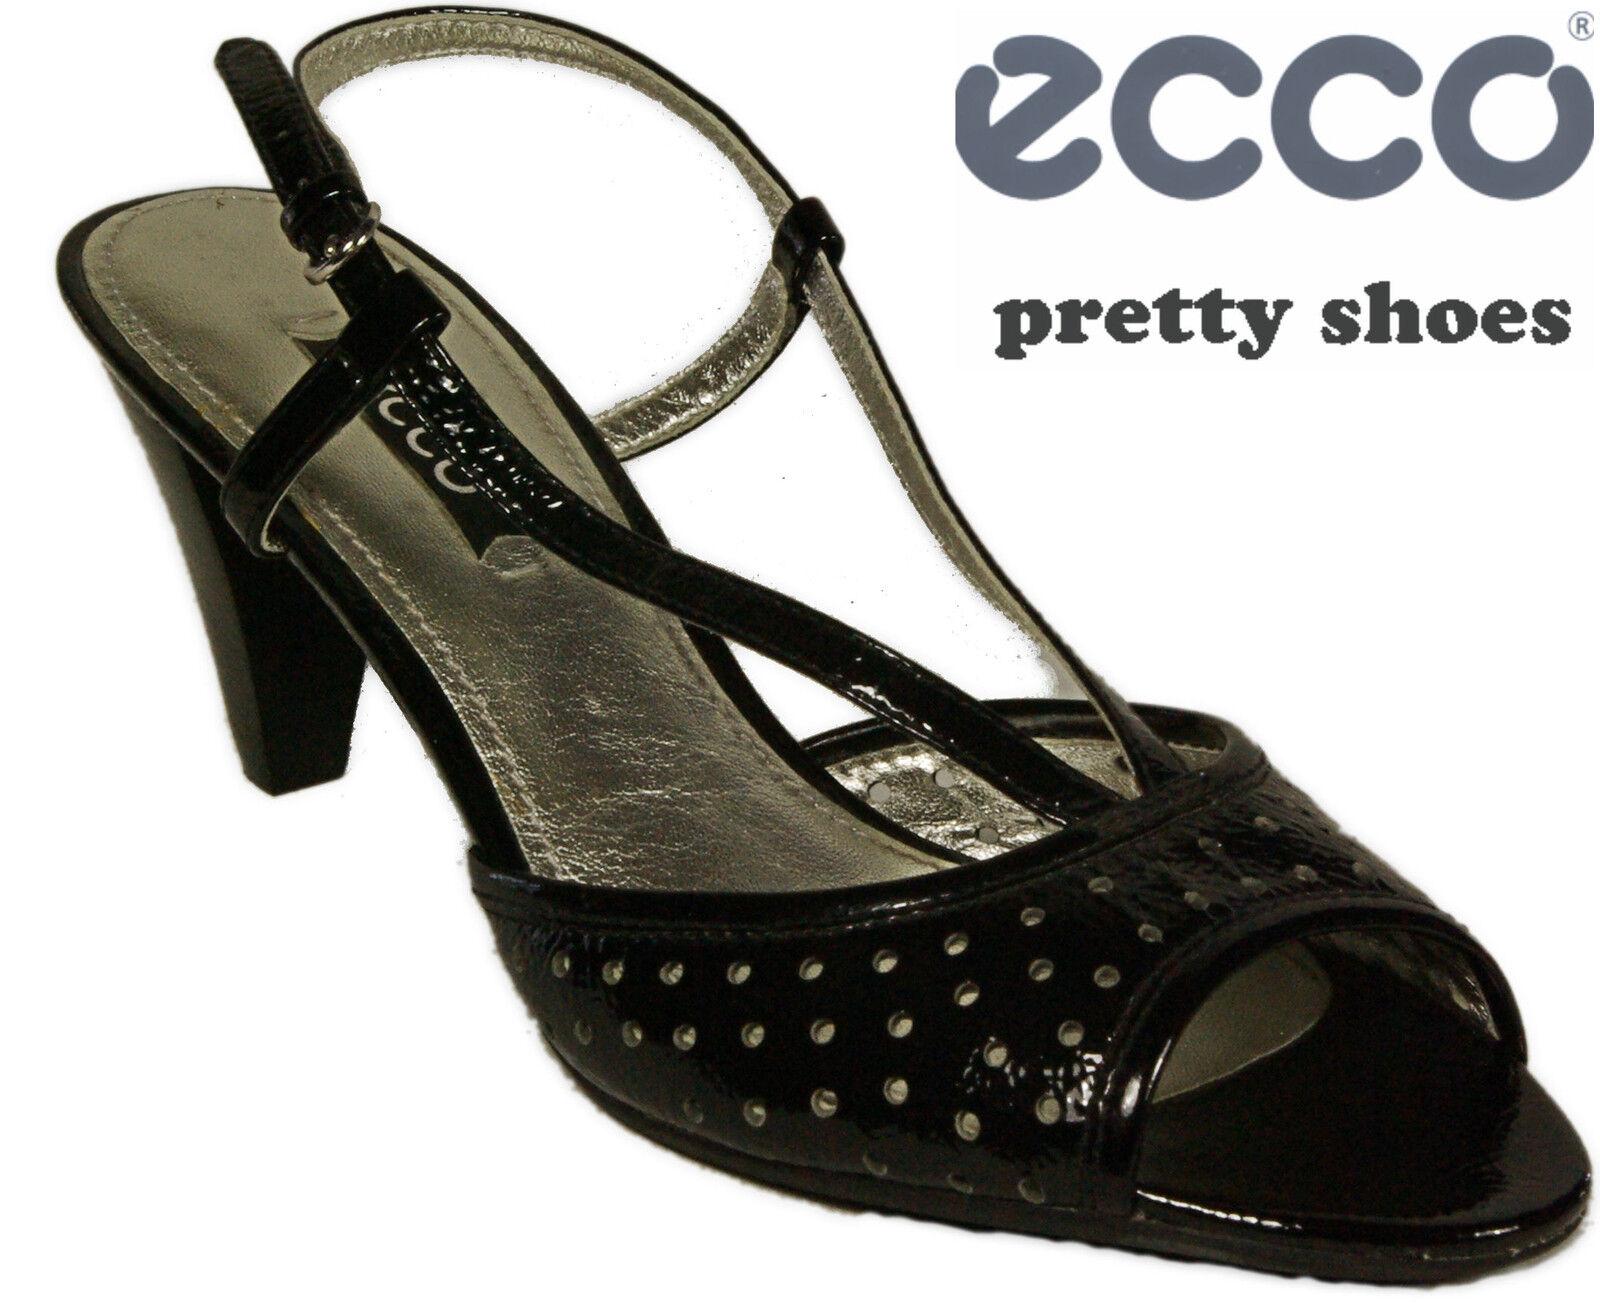 ECCO Schuhe elegante Sandaleetten Sling Pumps schwarz  Lack  Leder High Heel NEU